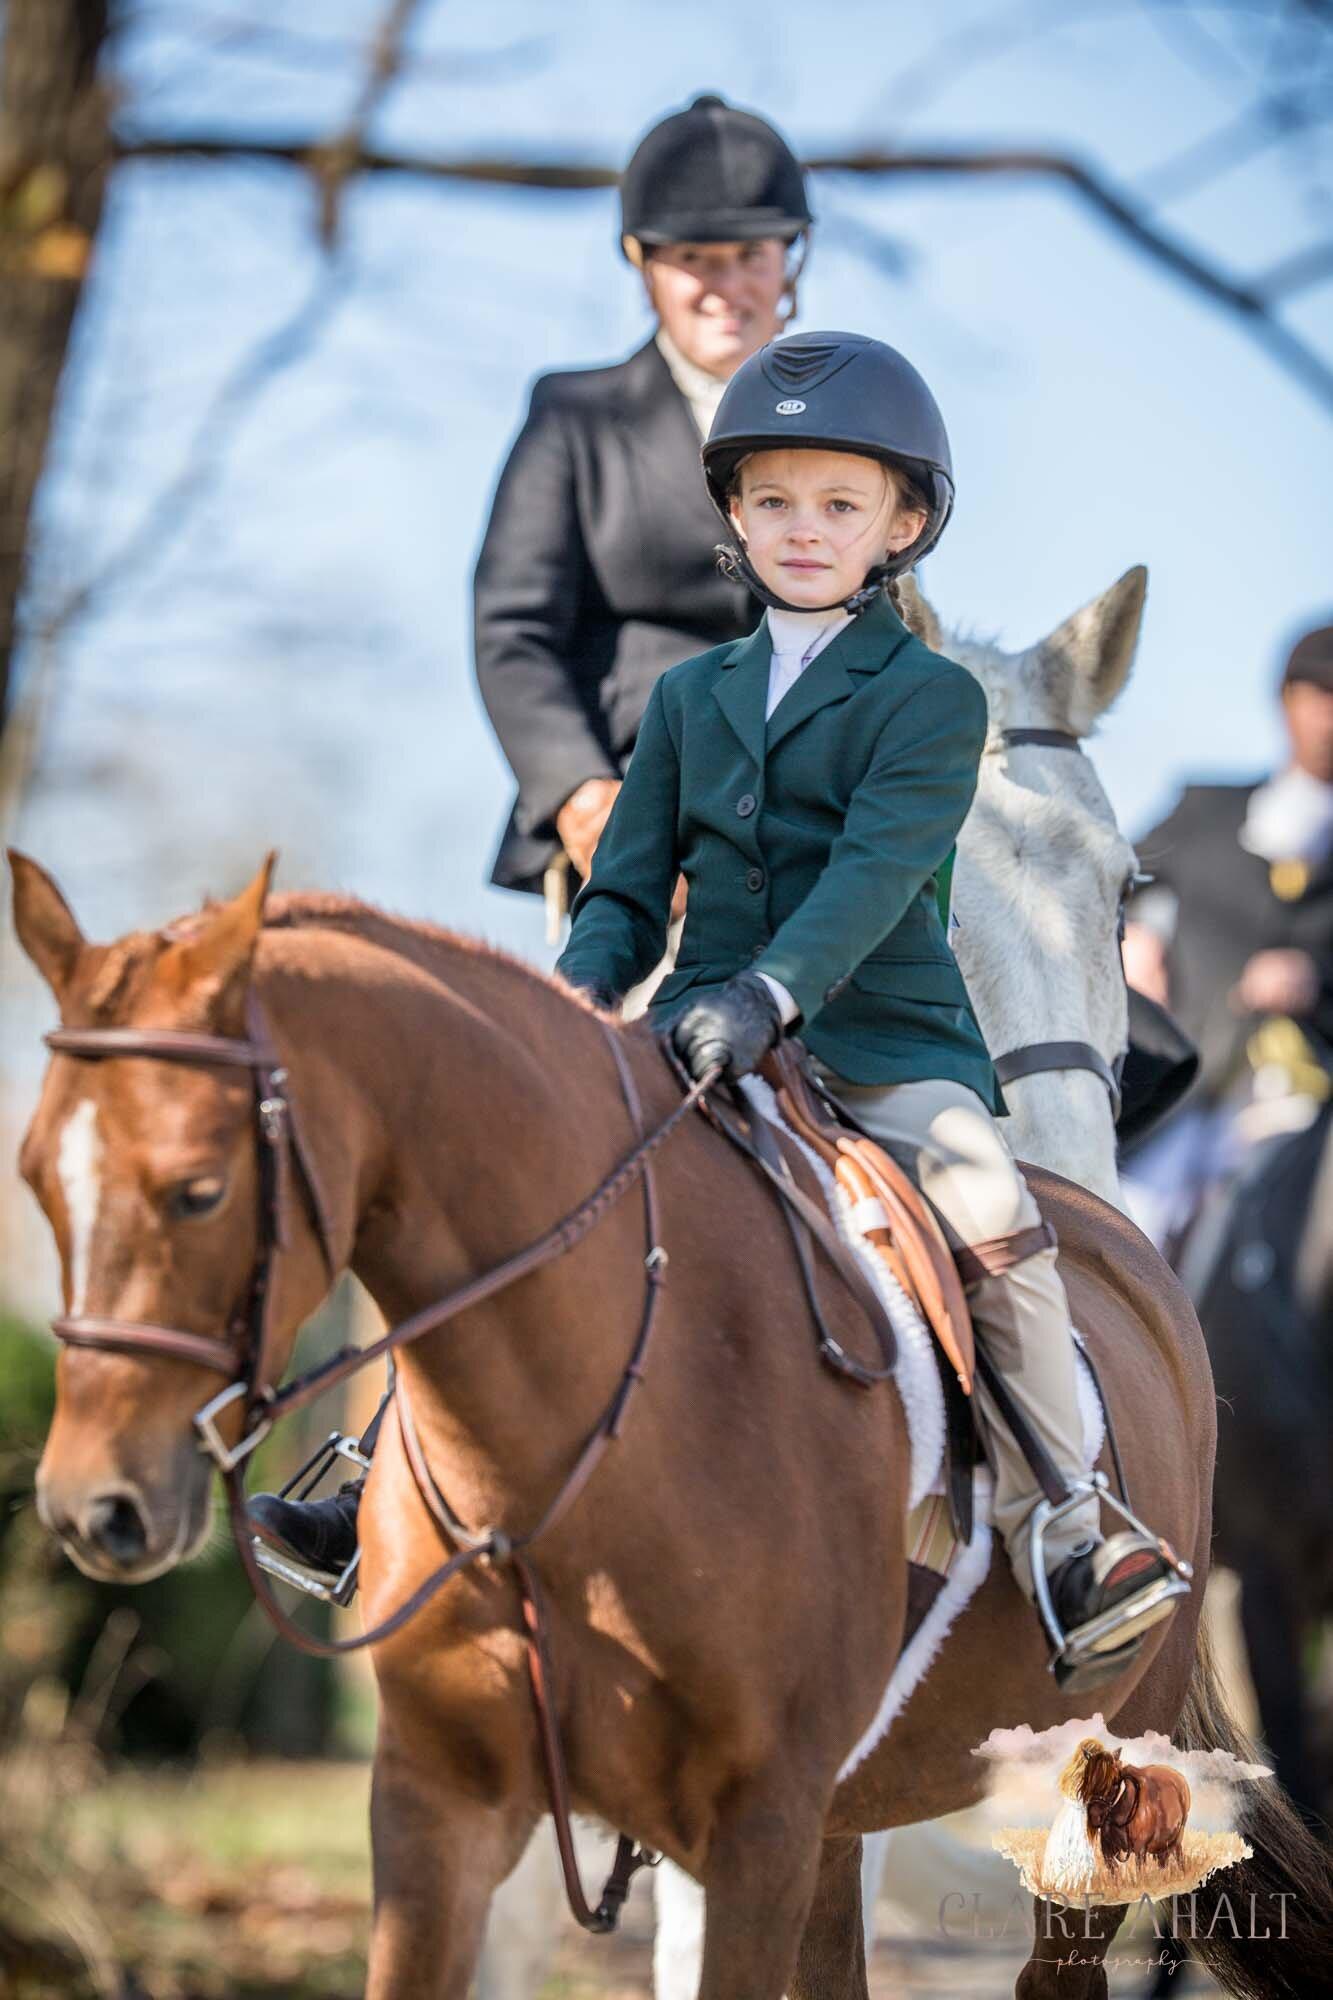 equine_photographer_potomac_md_equine_photographer_middleburg_VA_equine_portraiture_loudon_county_VA-3077.jpg